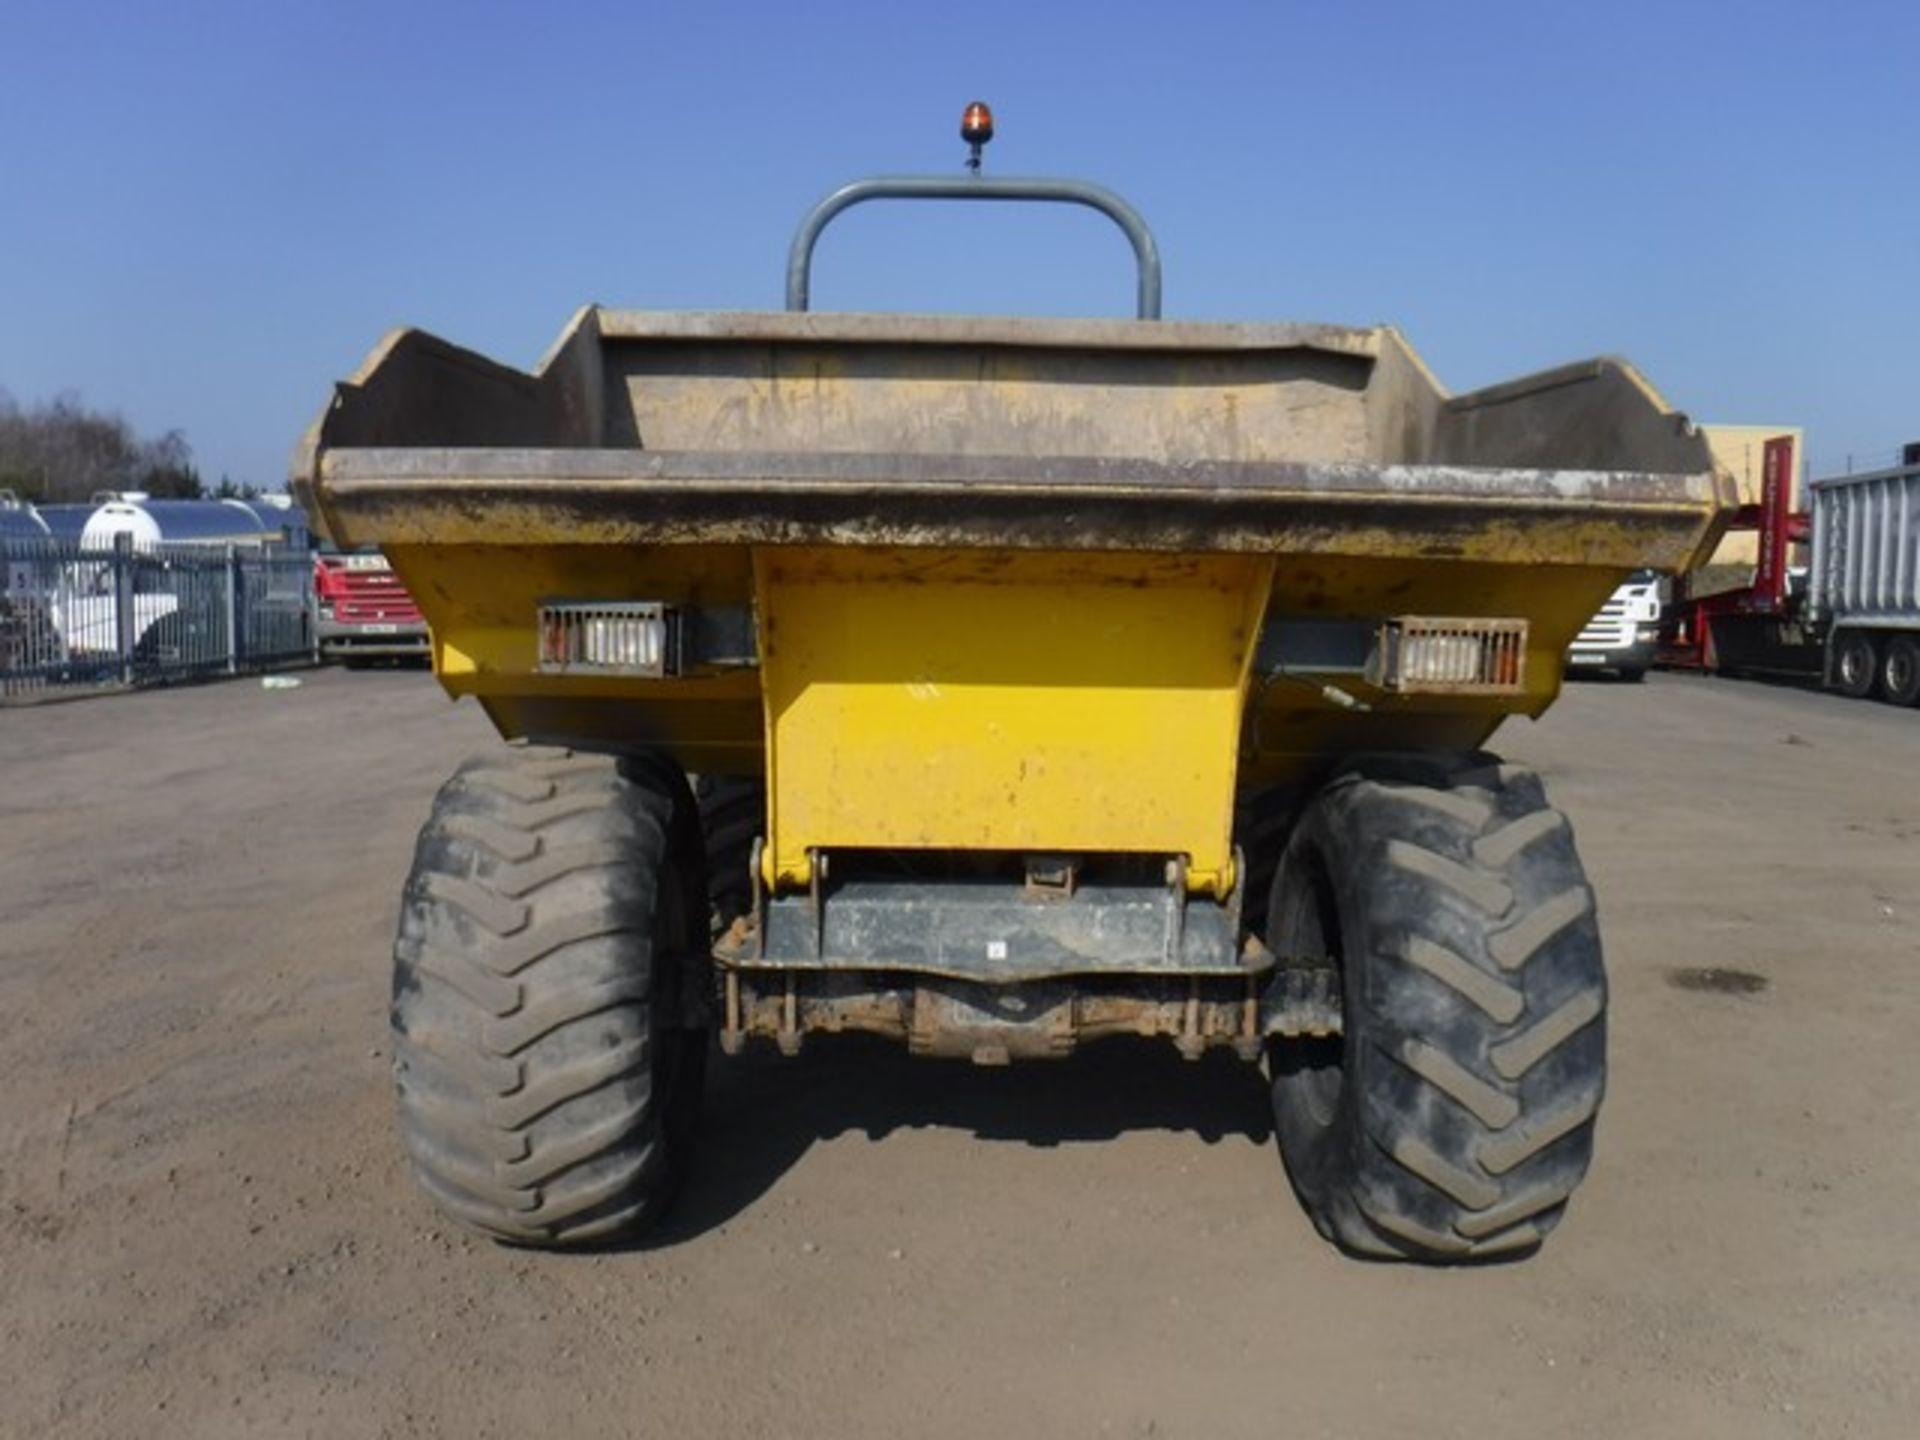 Auktionslos 831 - 2012 WACKER NEUSON 9001 9 ton dumper, 1883hrs (not verified) S/N PAL00168